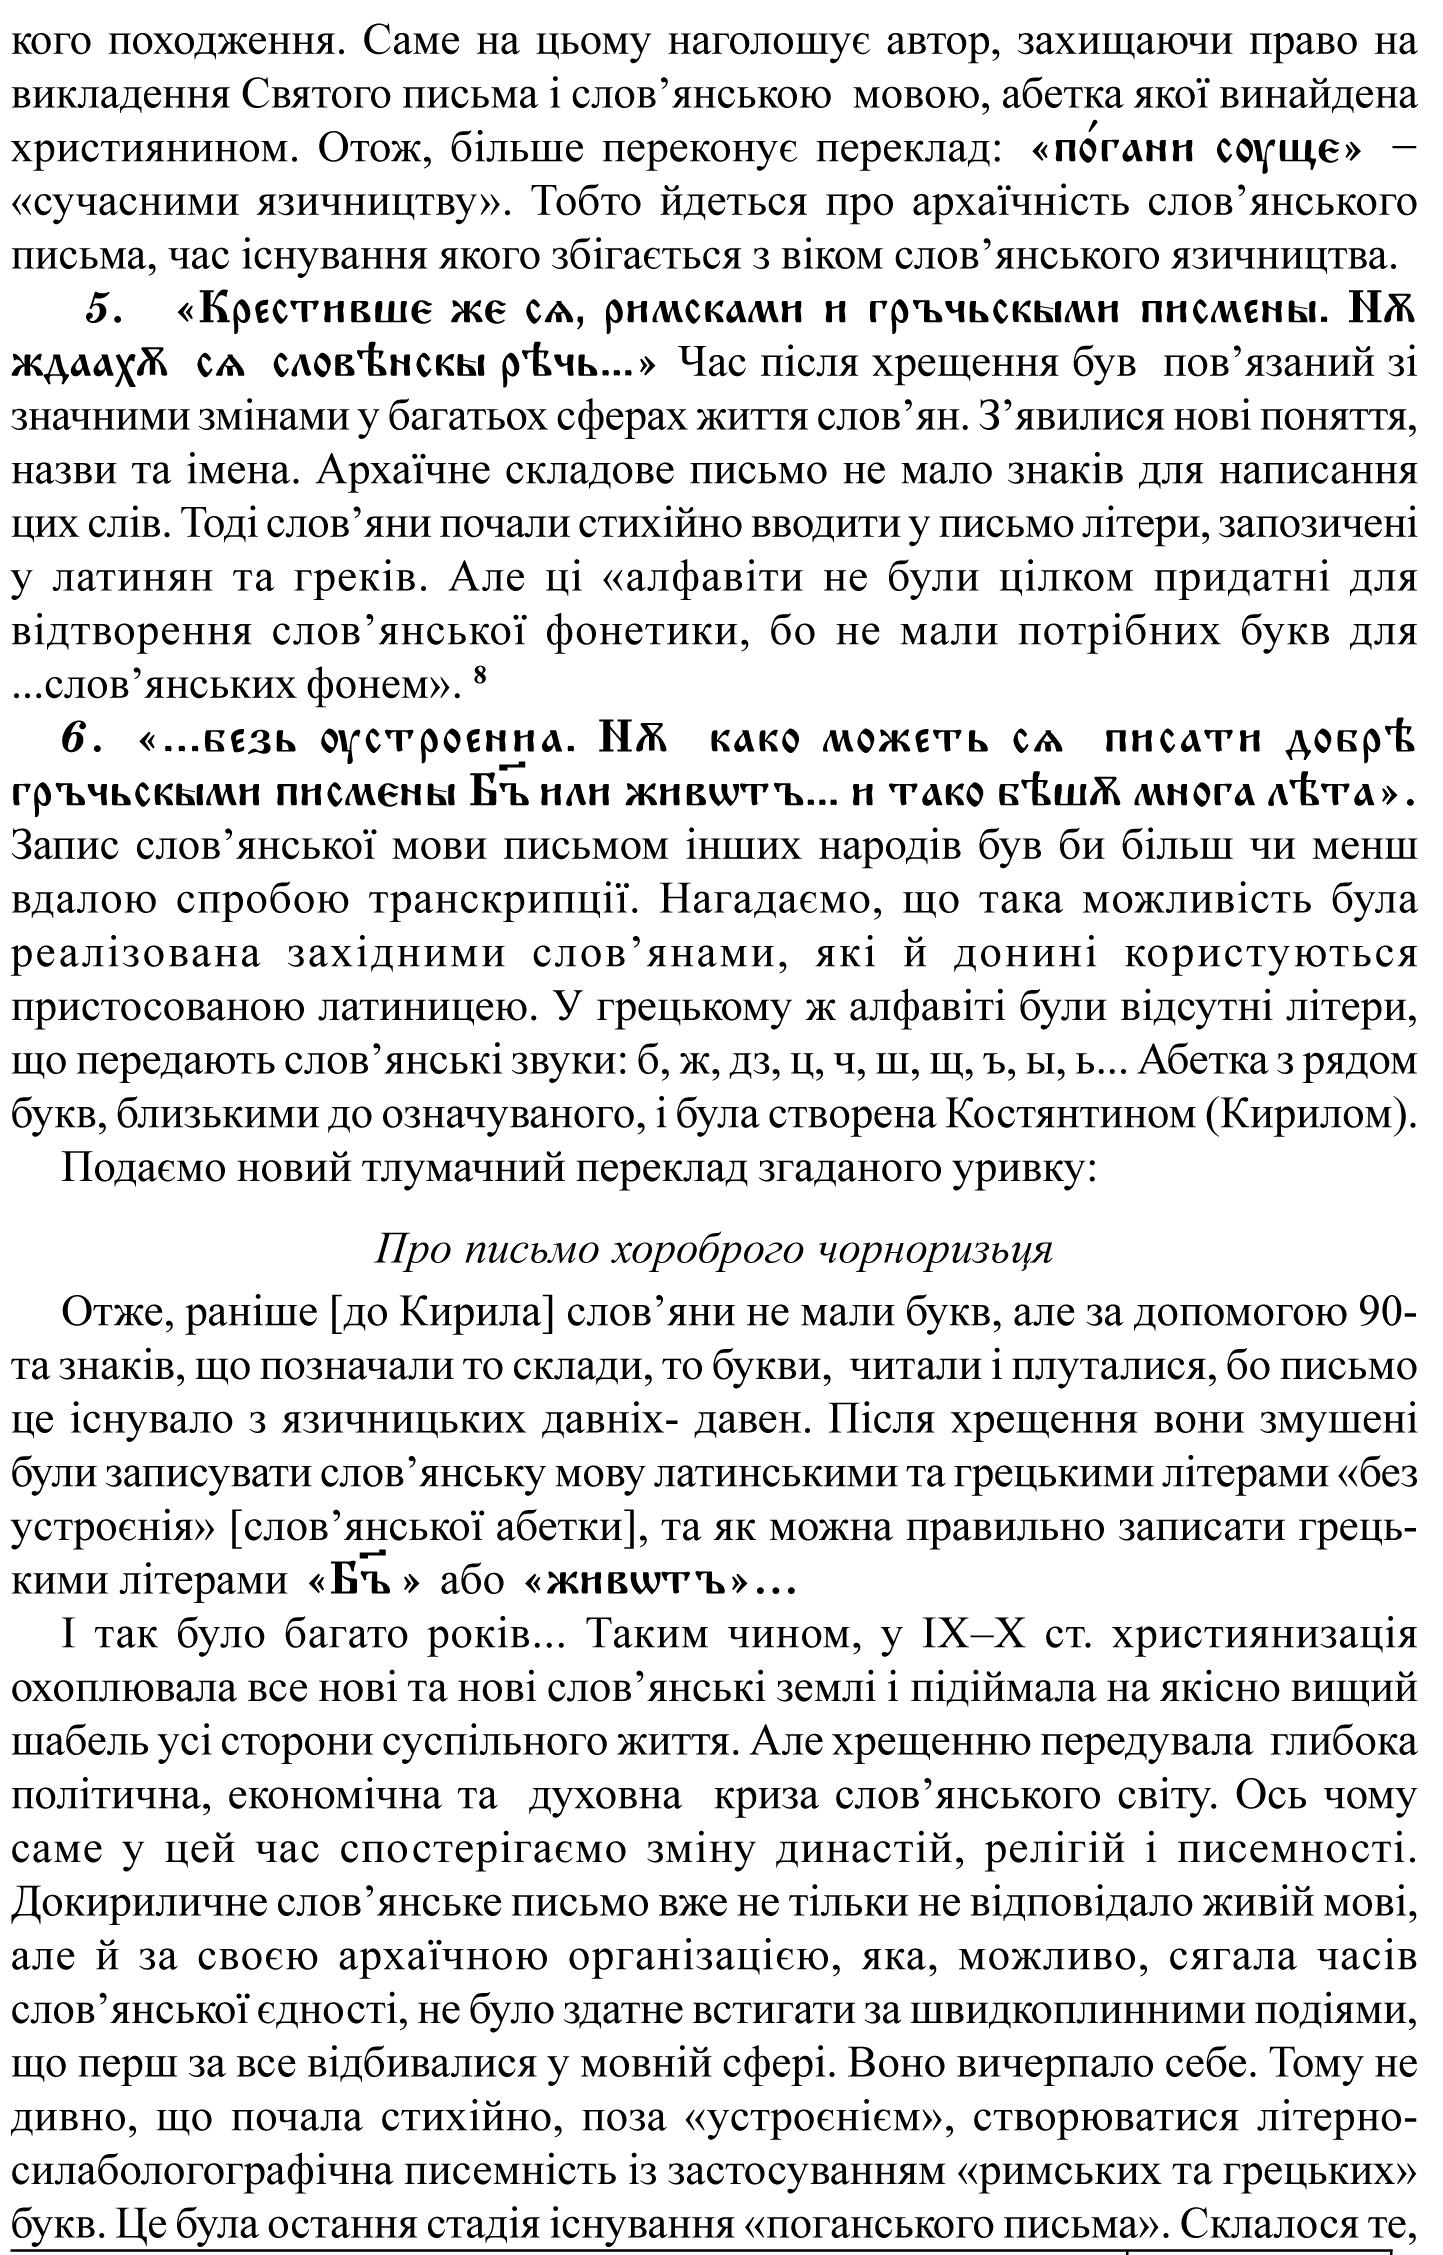 Докирил письмо-3.png